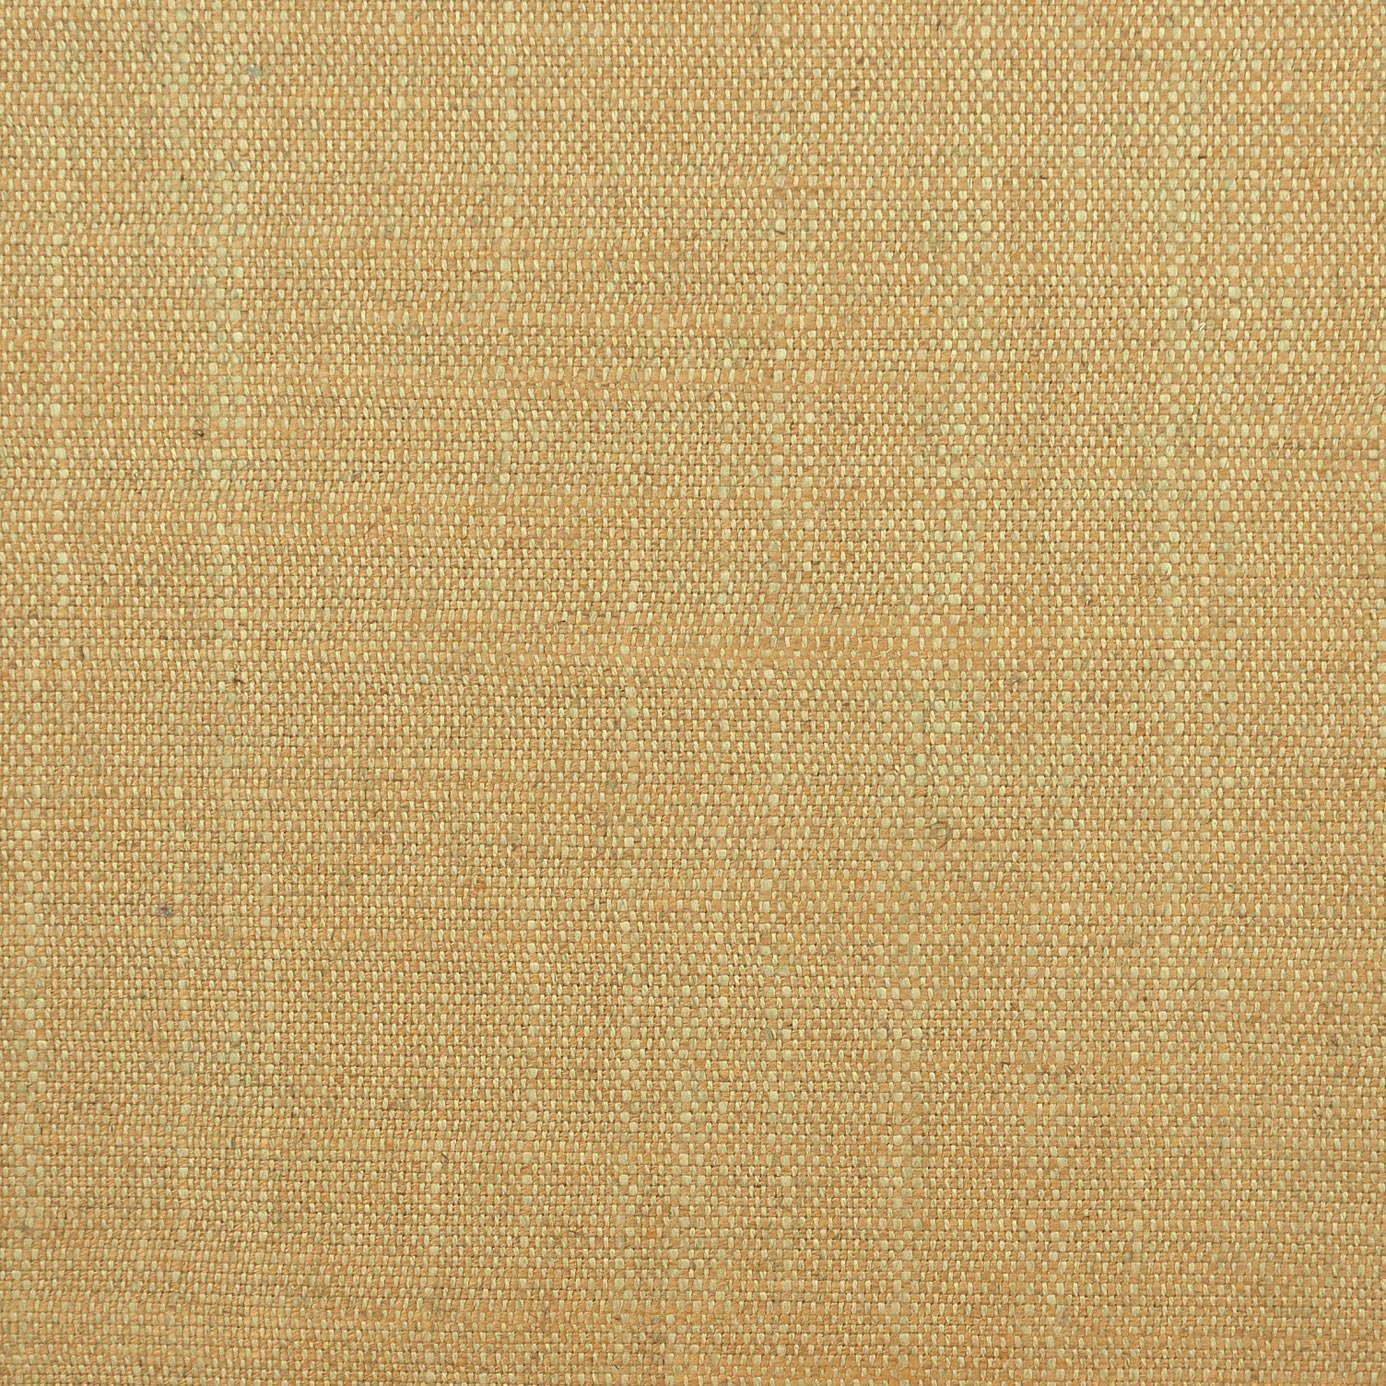 Asuri Fabric Clementine 7726 46 Romo Asuri Fabrics